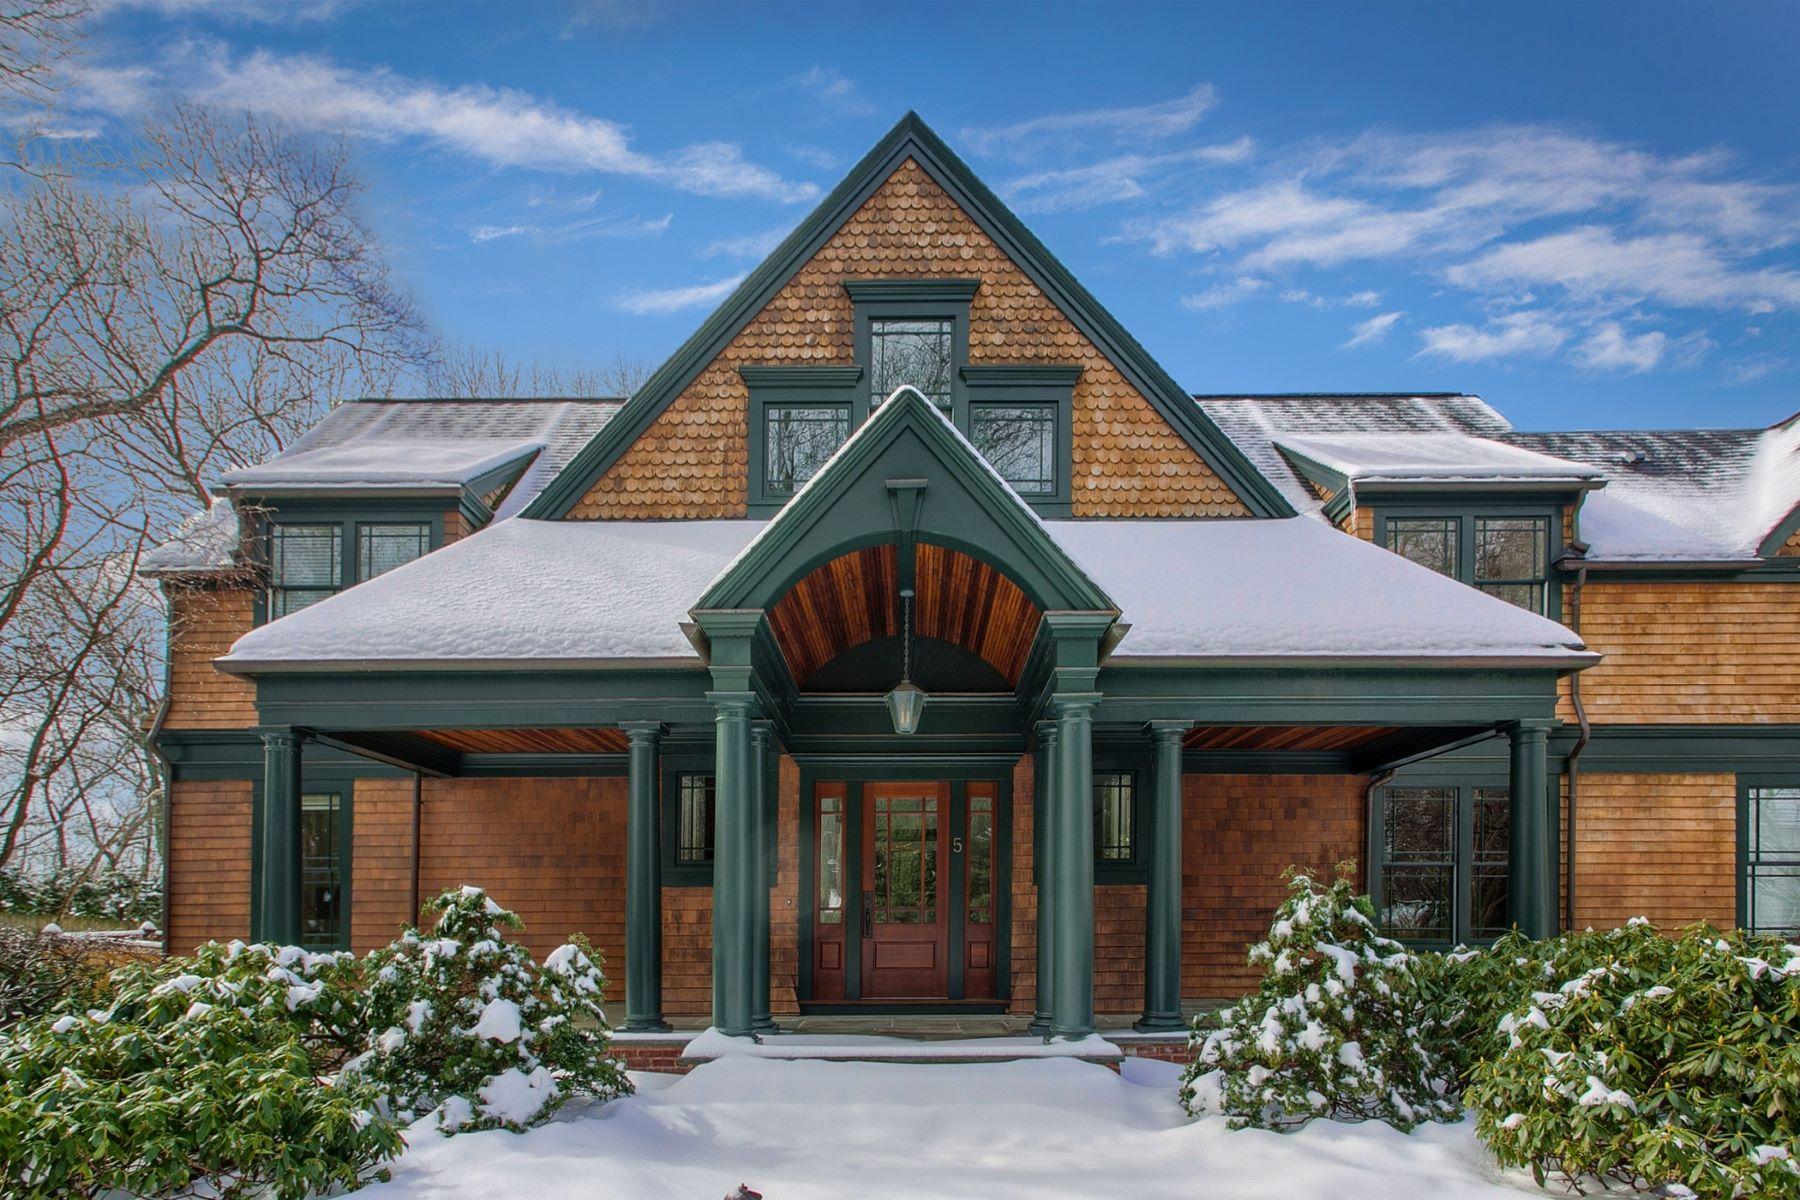 Single Family Home for Active at 5 Pinewood Street, Lexington 5 Pinewood St Lexington, Massachusetts 02421 United States